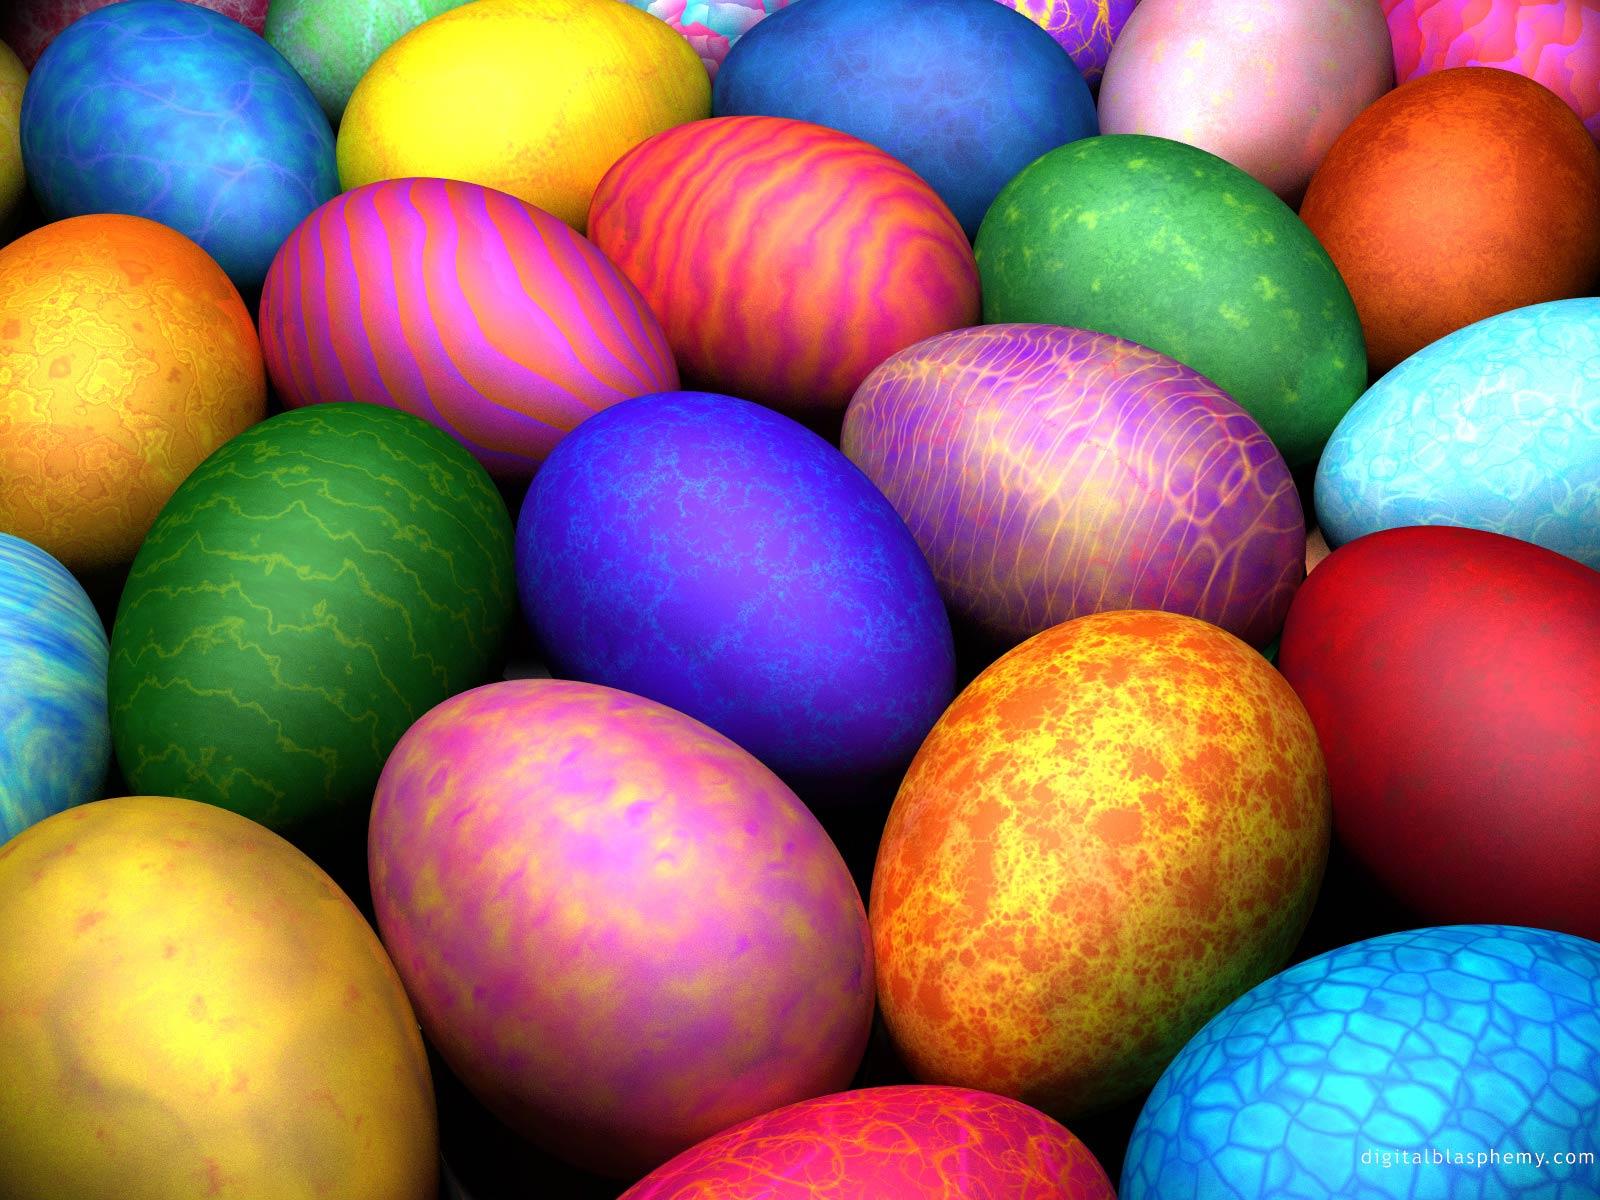 76] Easter Desktop Wallpapers on WallpaperSafari 1600x1200